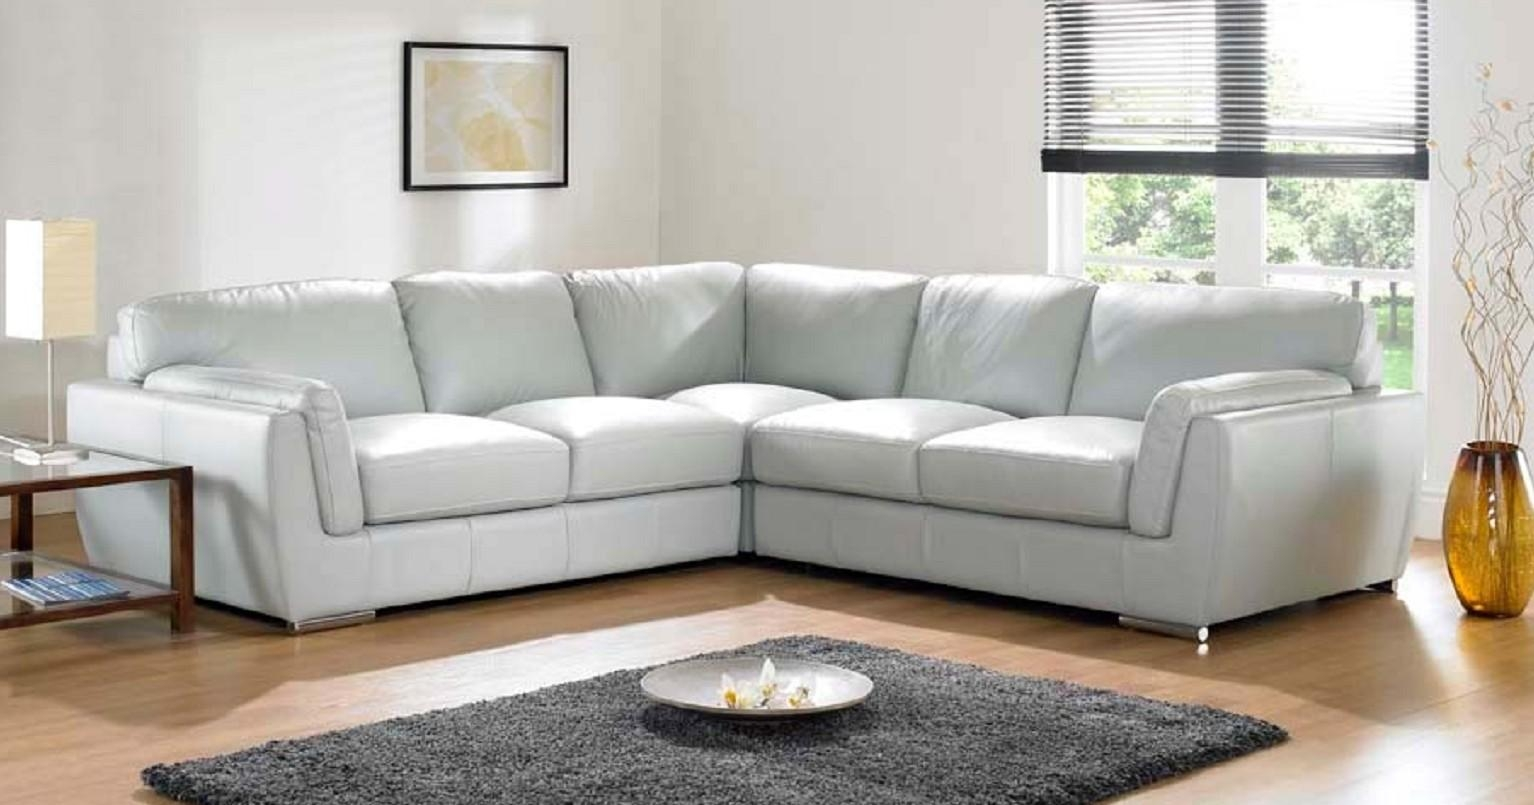 Leather Corner Sofa Grey | Tehranmix Decoration Regarding White Leather Corner Sofa (Image 9 of 20)